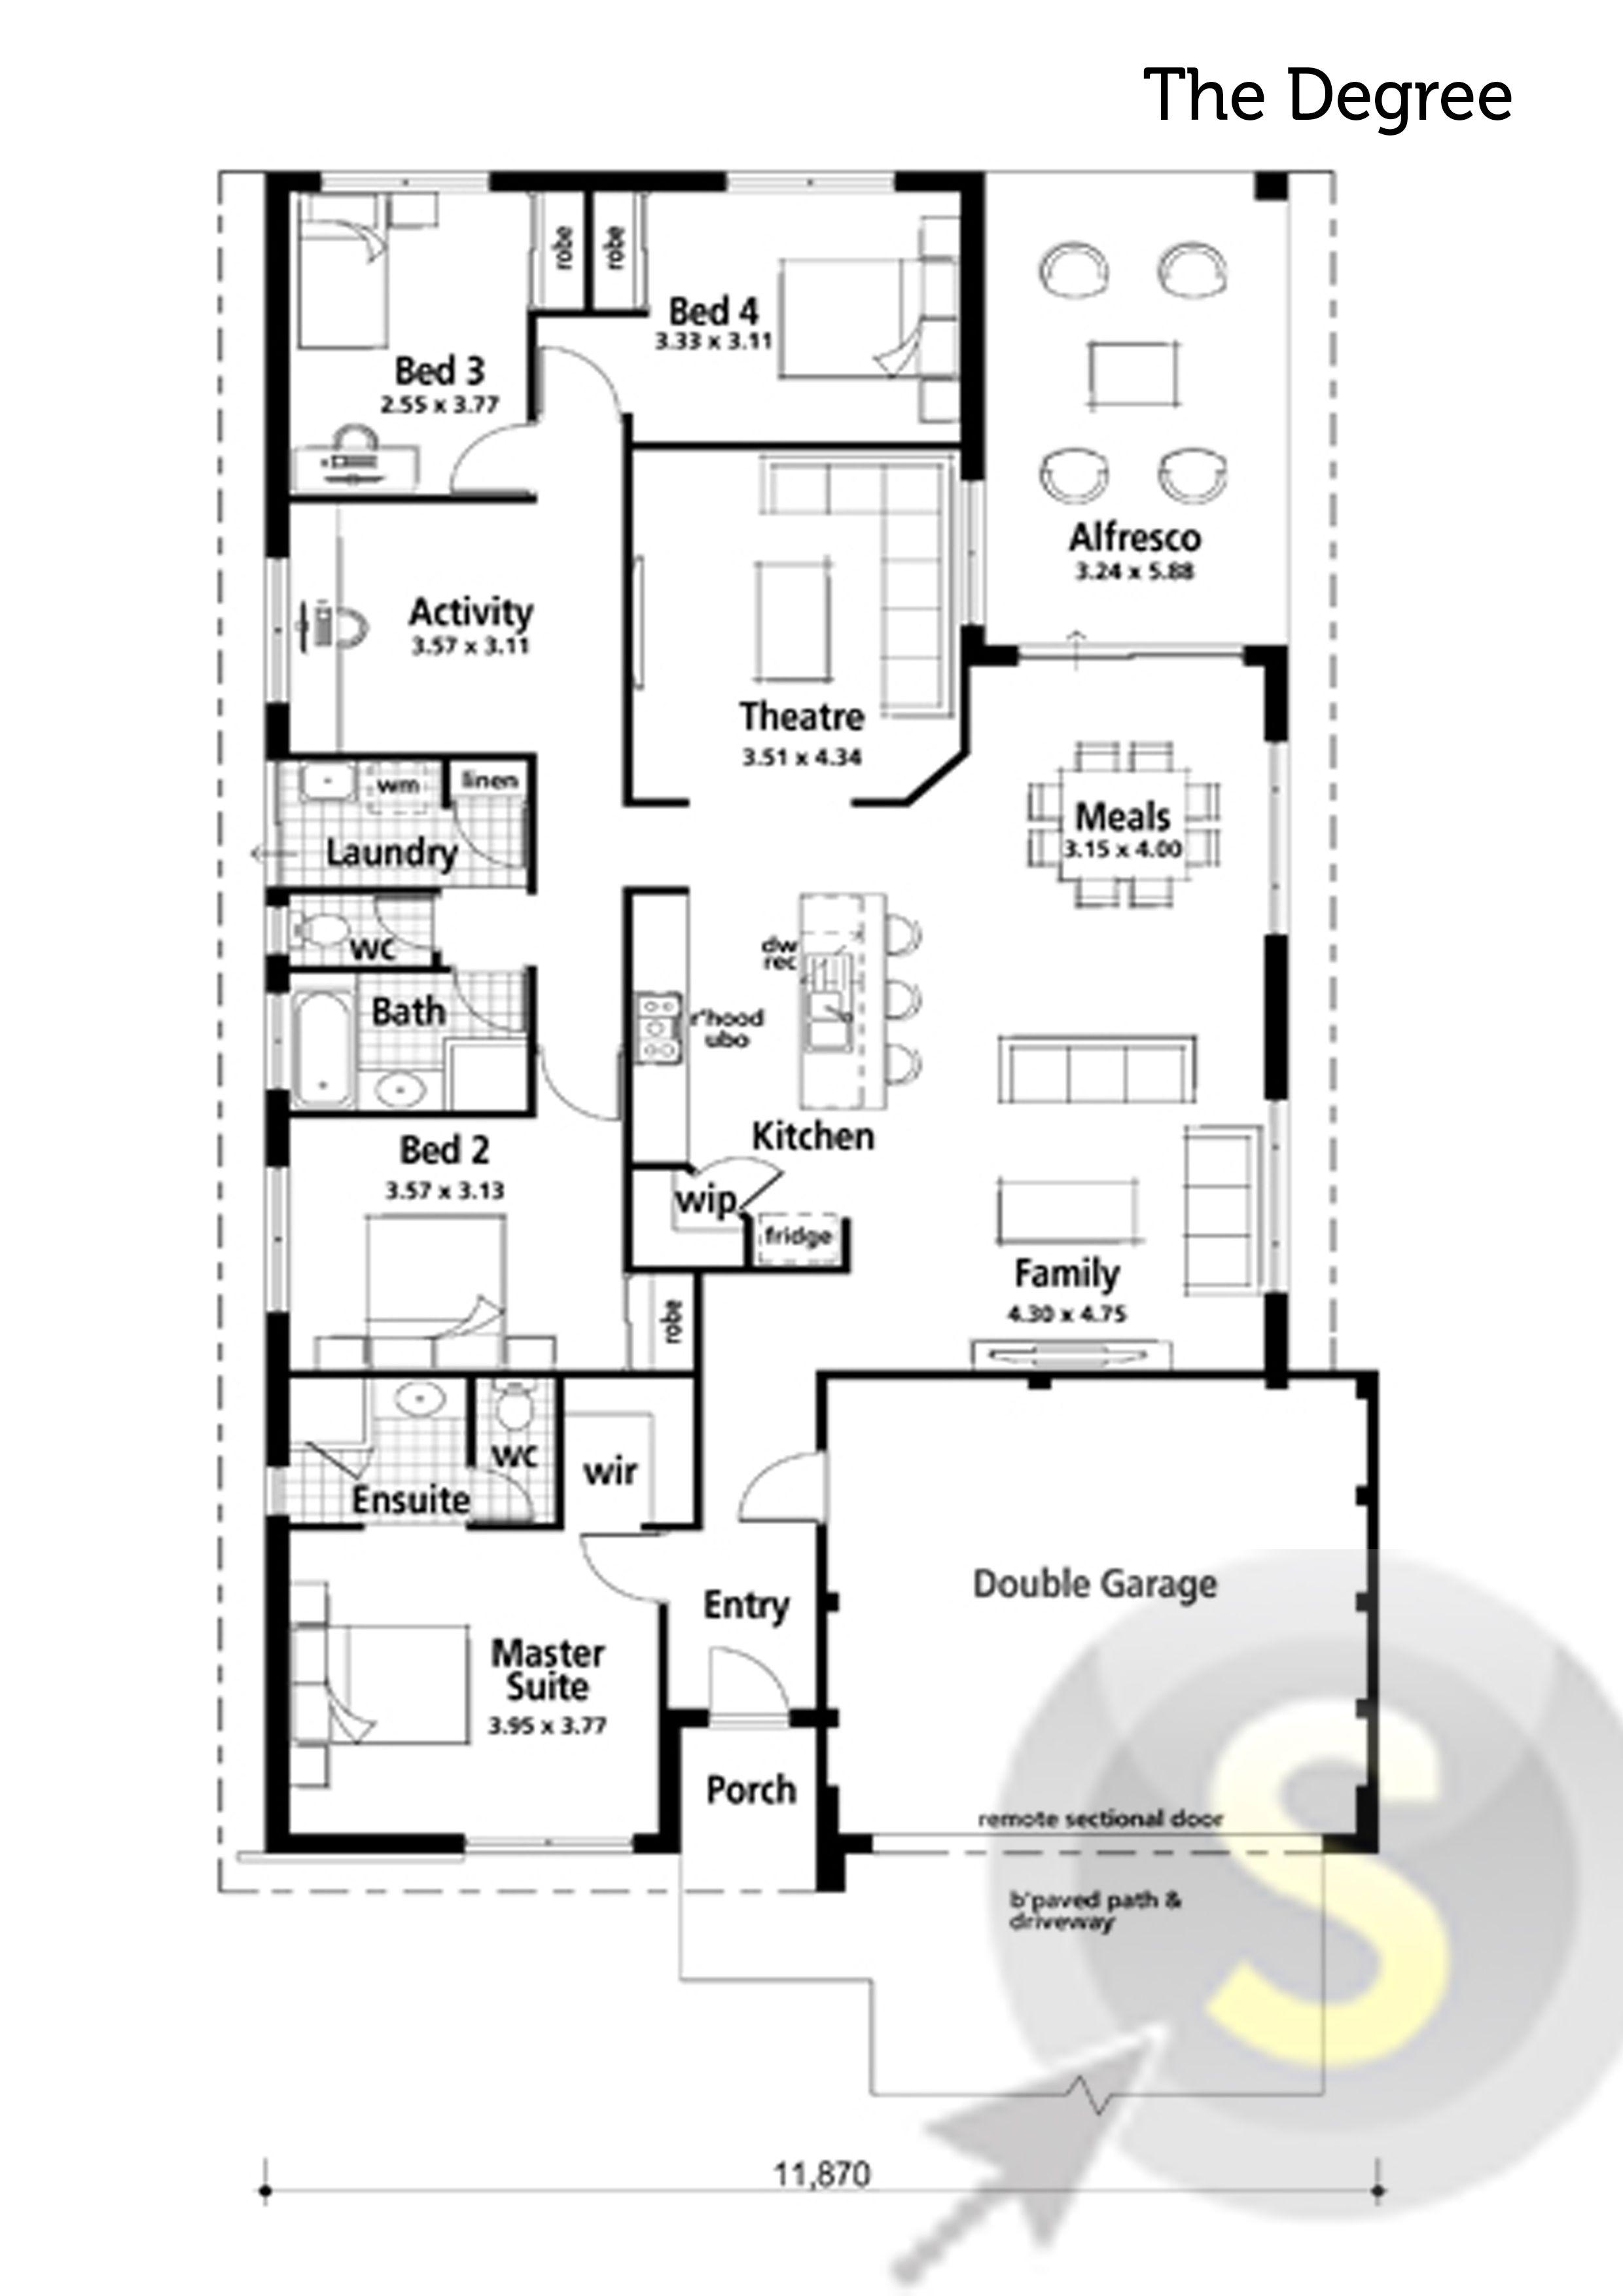 The Degree Floorplan 14m Frontage 4x2 Alfresco